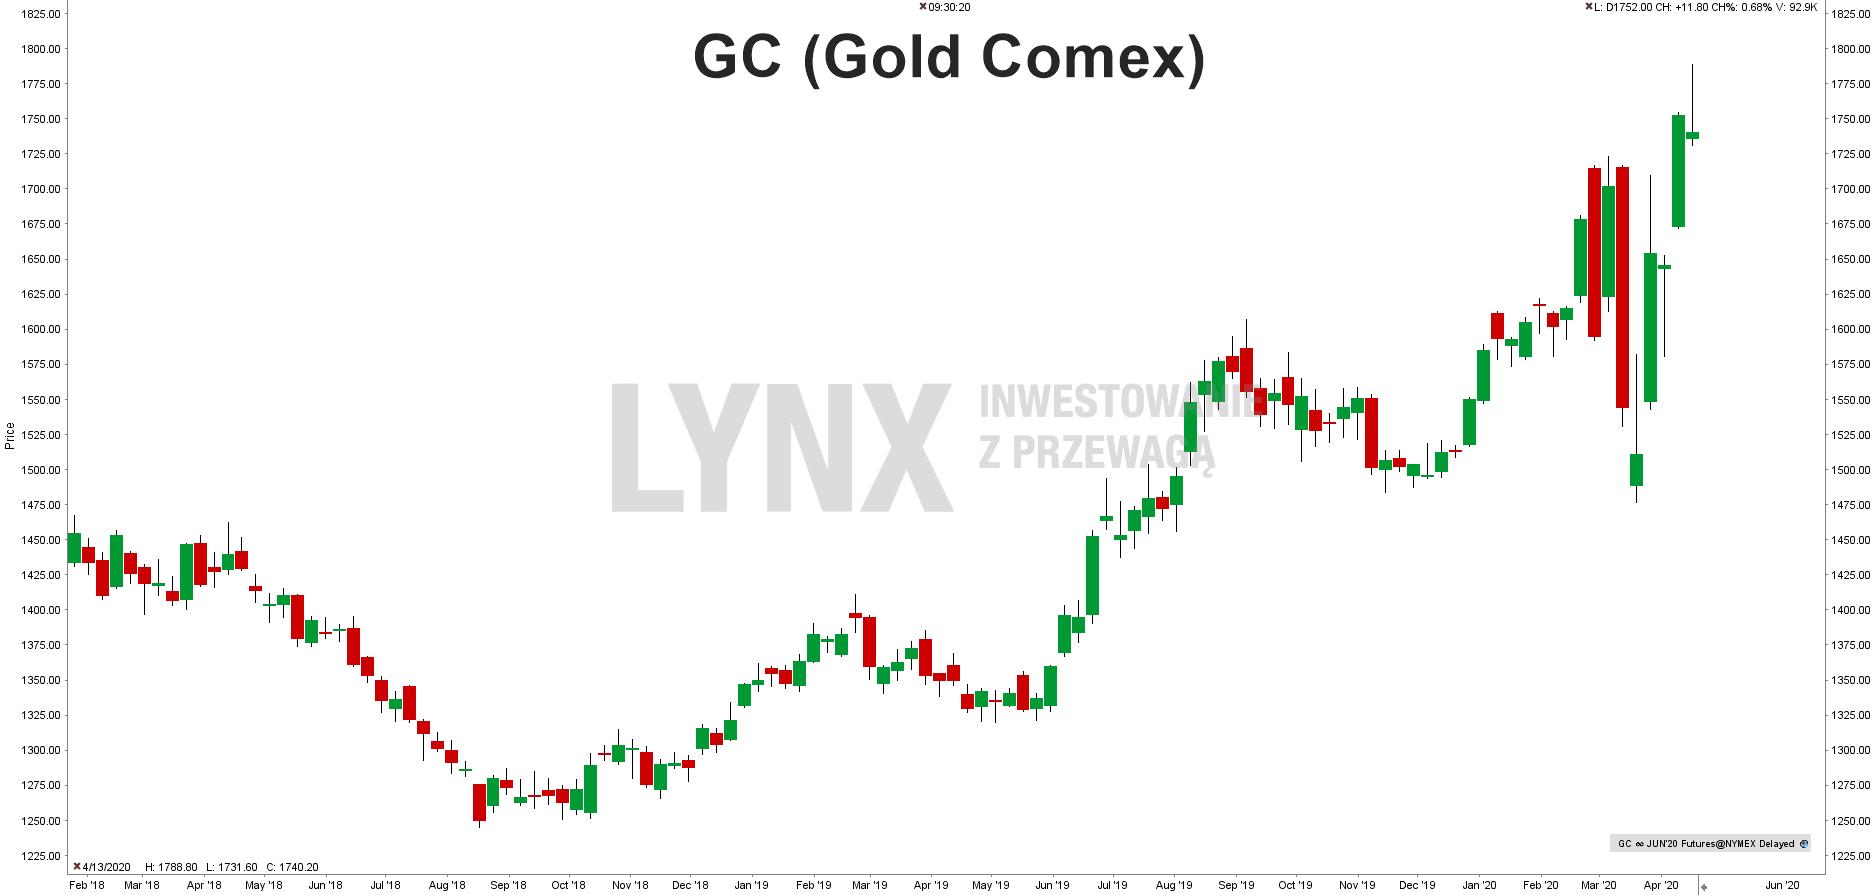 GC (Gold Comex)